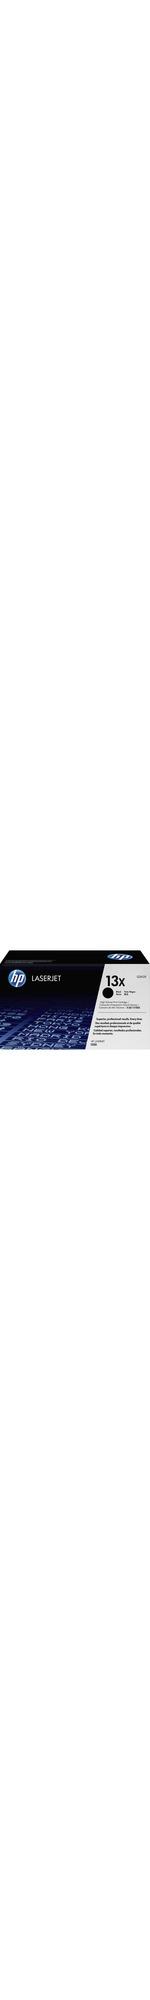 HP 13X Toner Cartridge - Black - Laser - 4000 Page - 1 Each